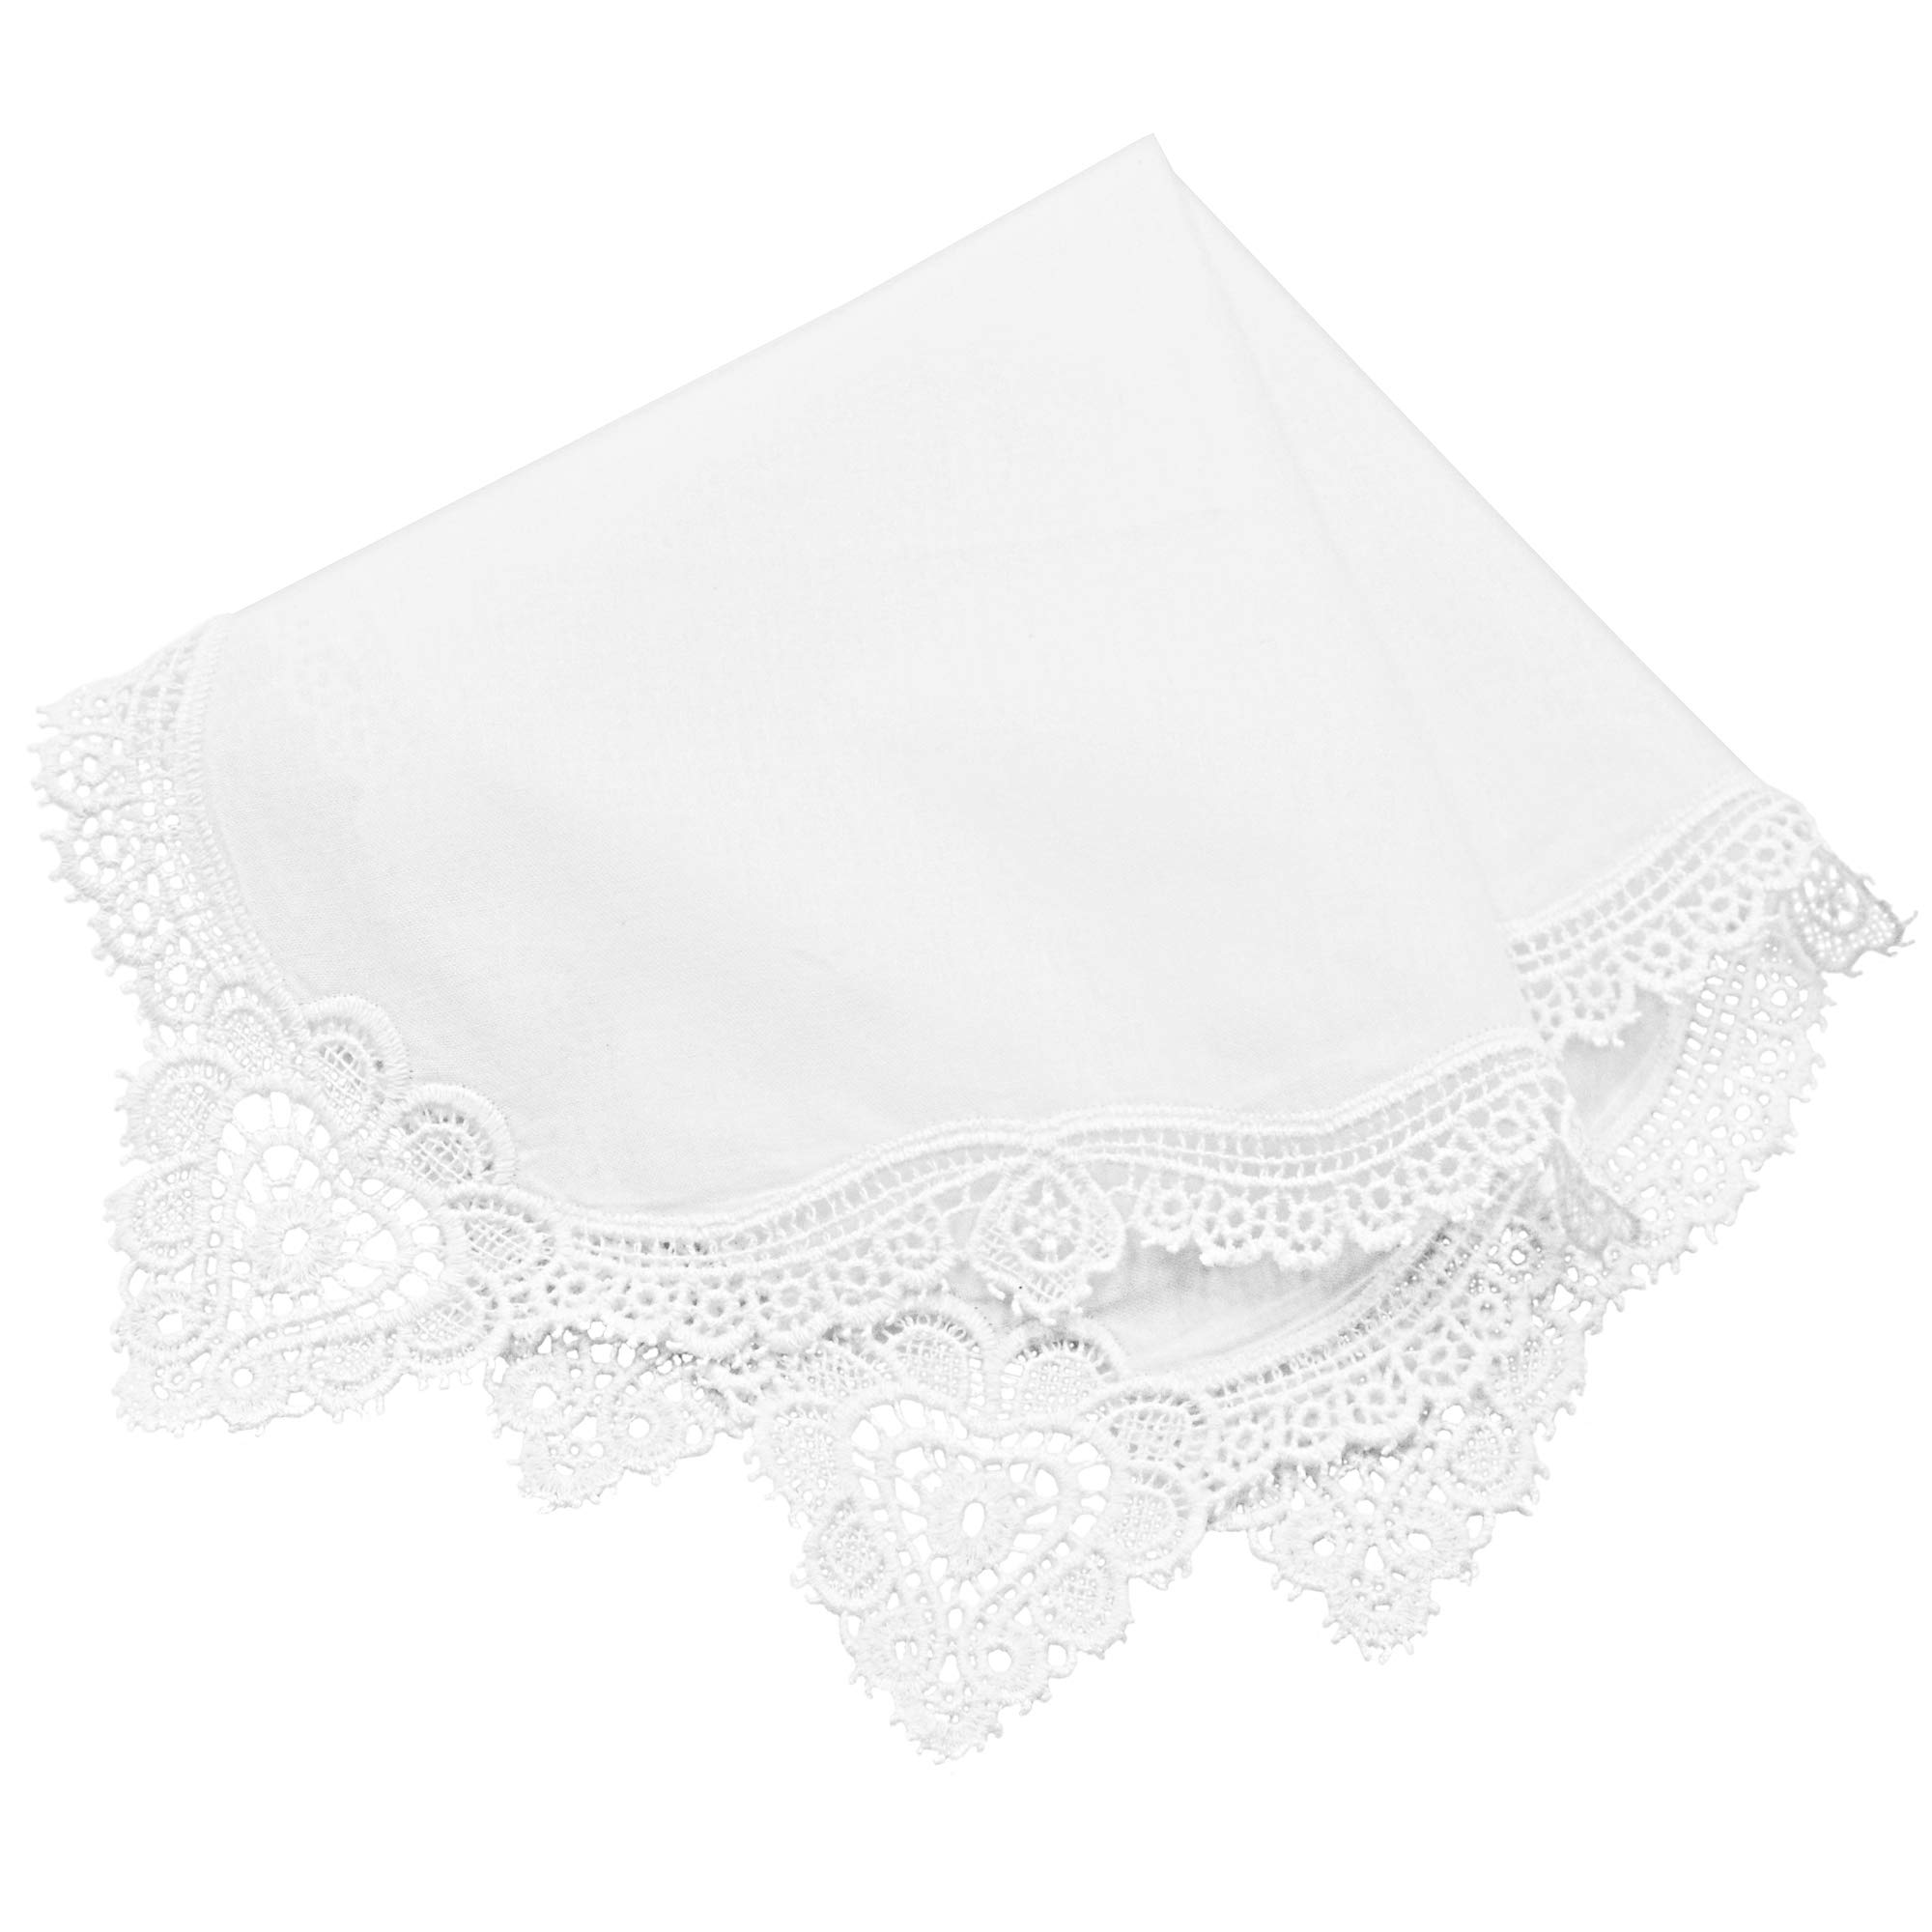 Milesky Bridal Wedding Crochet Lace Handkerchief Premium 60S Cotton CH09